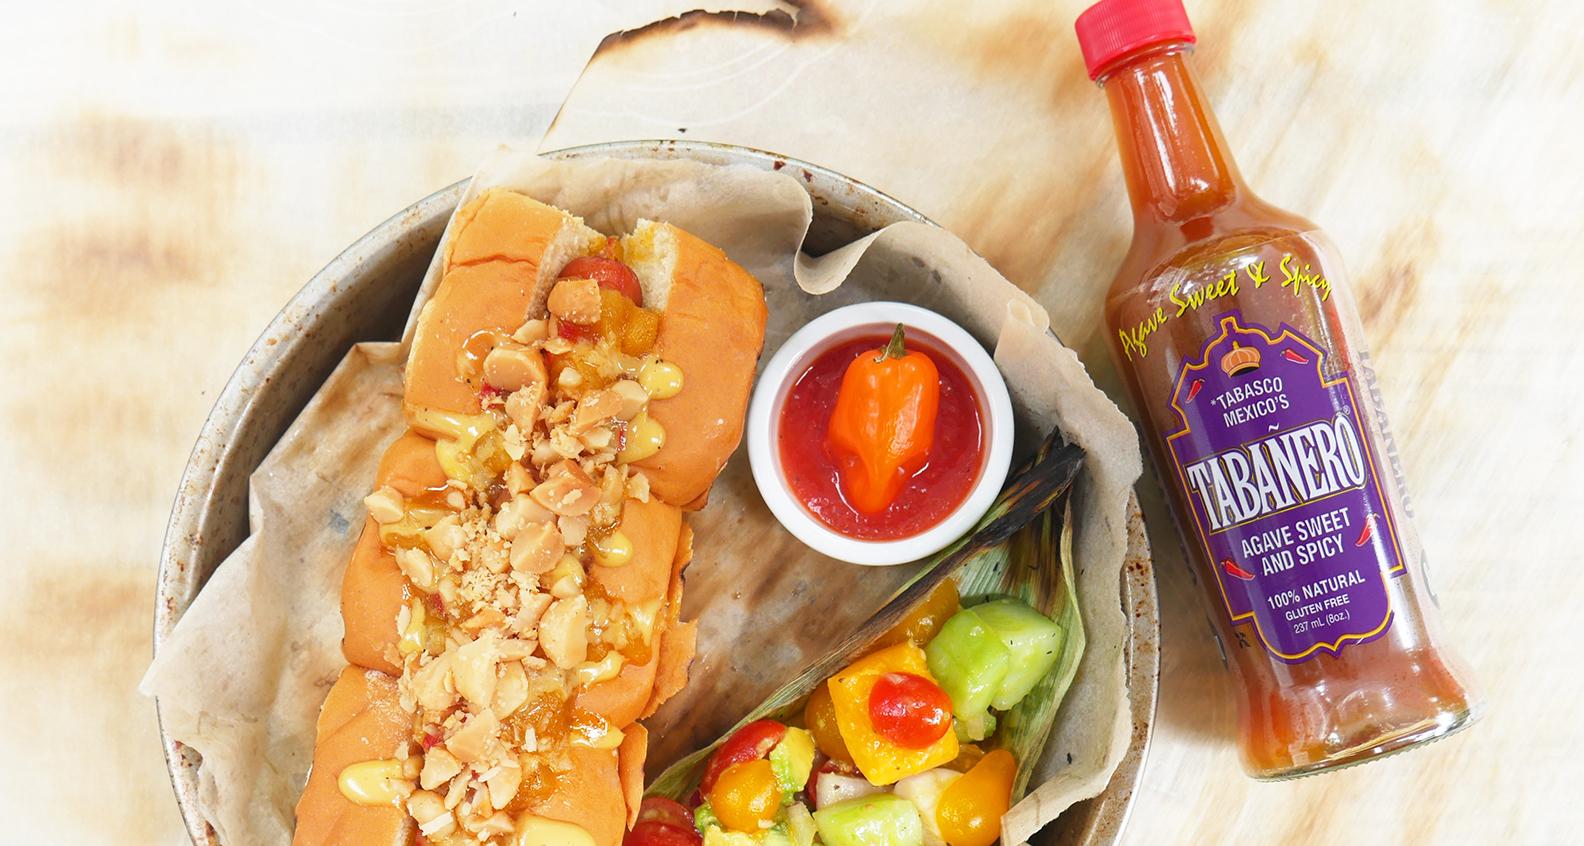 Southern hot sauce florida tabanero hawaiian style hot dog